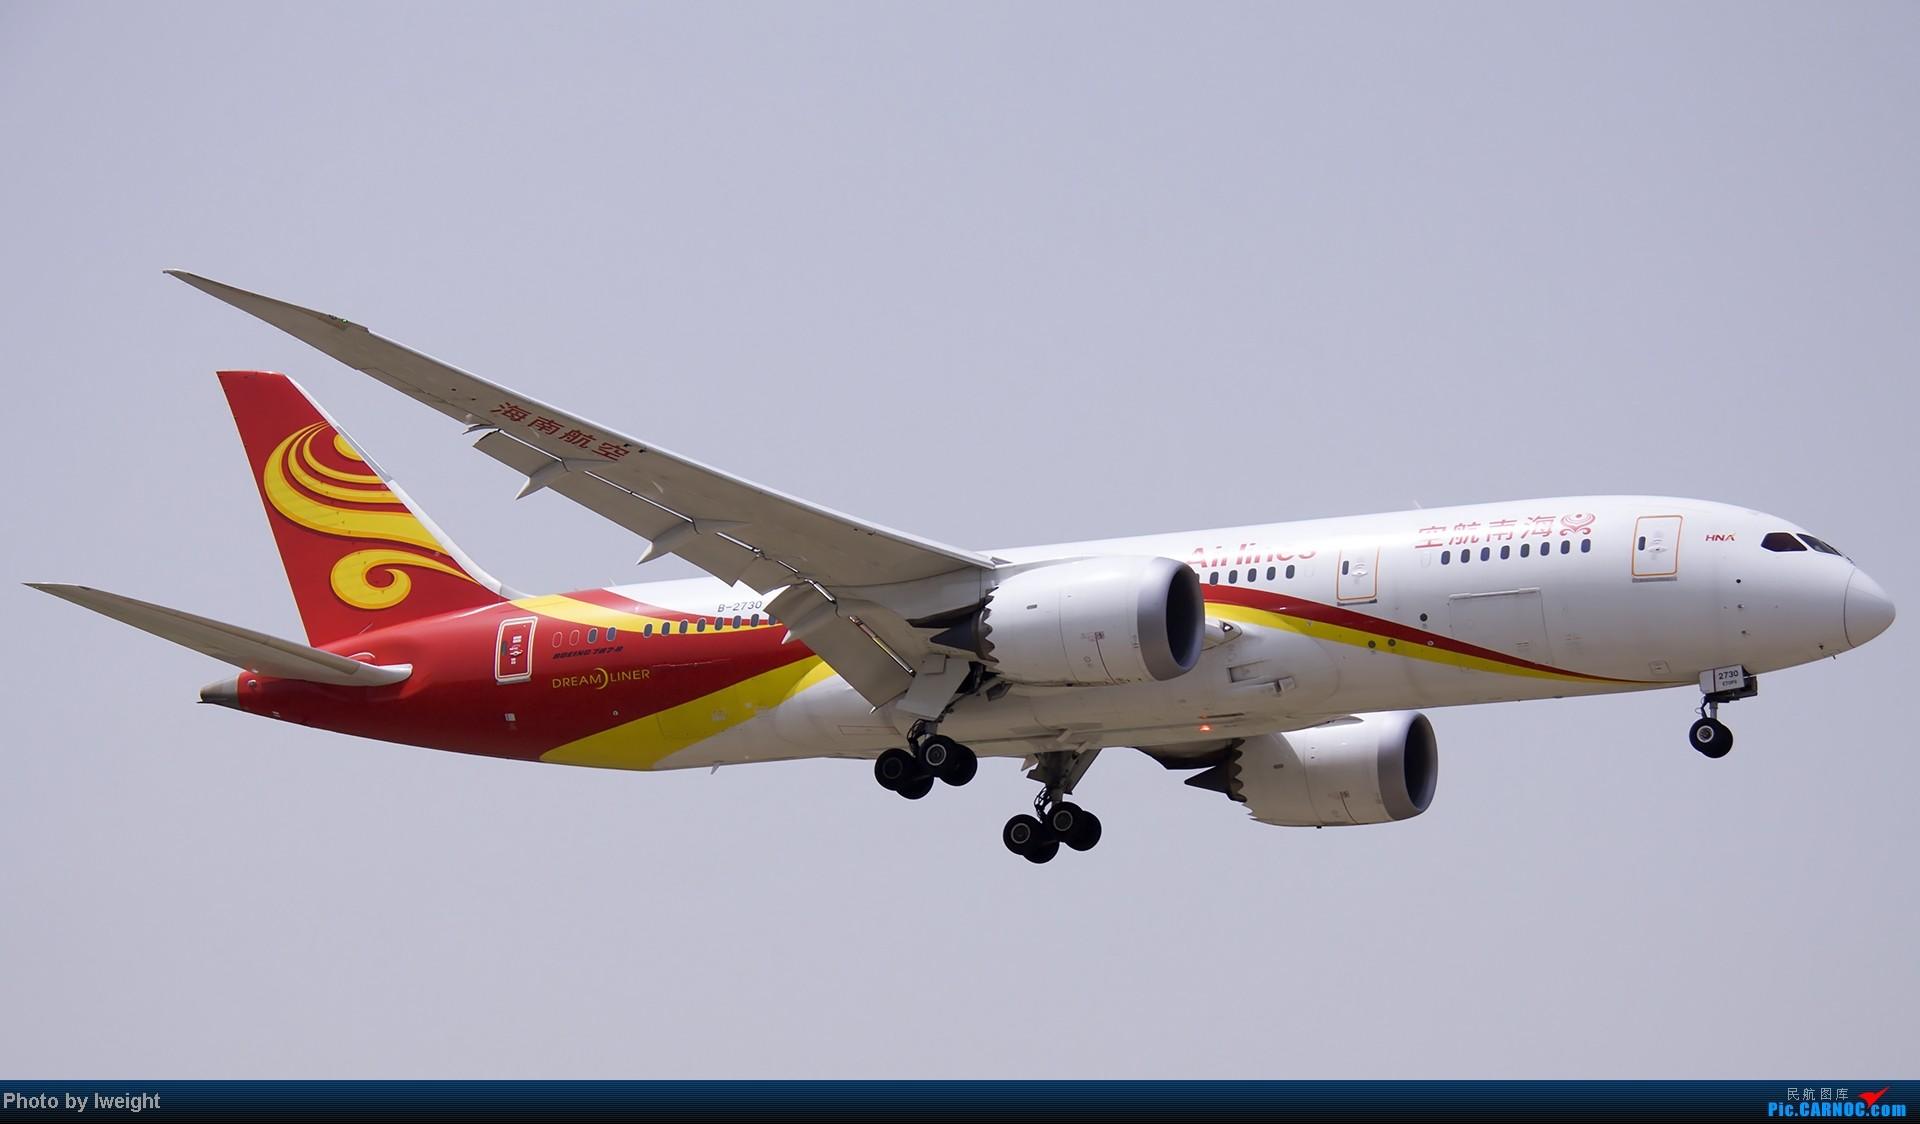 Re:[原创]霾天首都机场随拍 BOEING 787-8 B-2730 中国北京首都机场